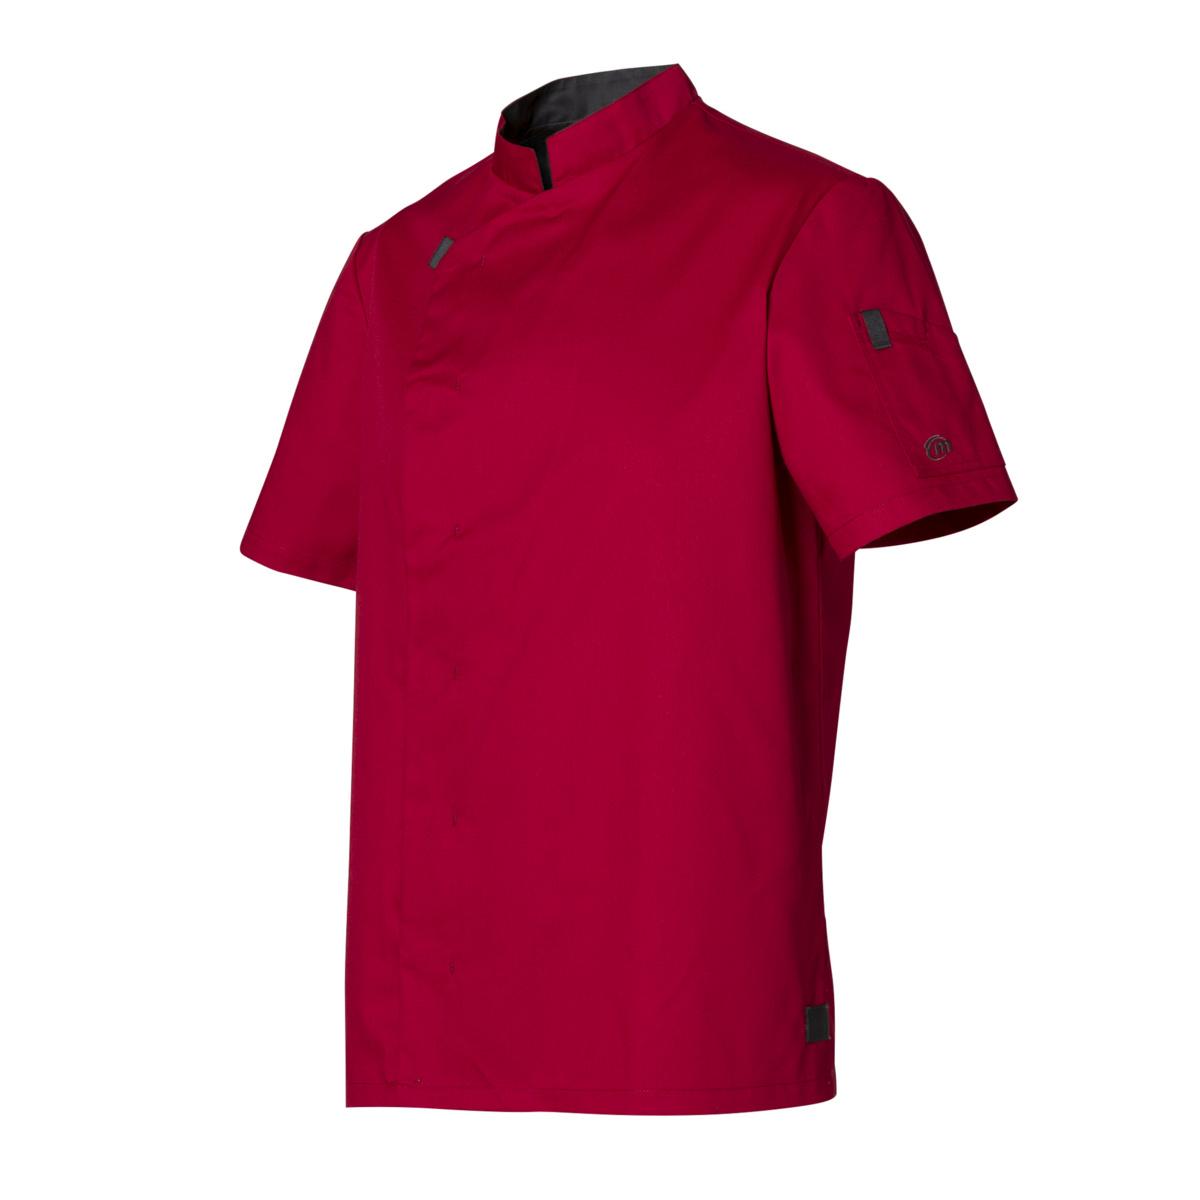 Veste de cuisine rouge taille 0 Shade Molinel